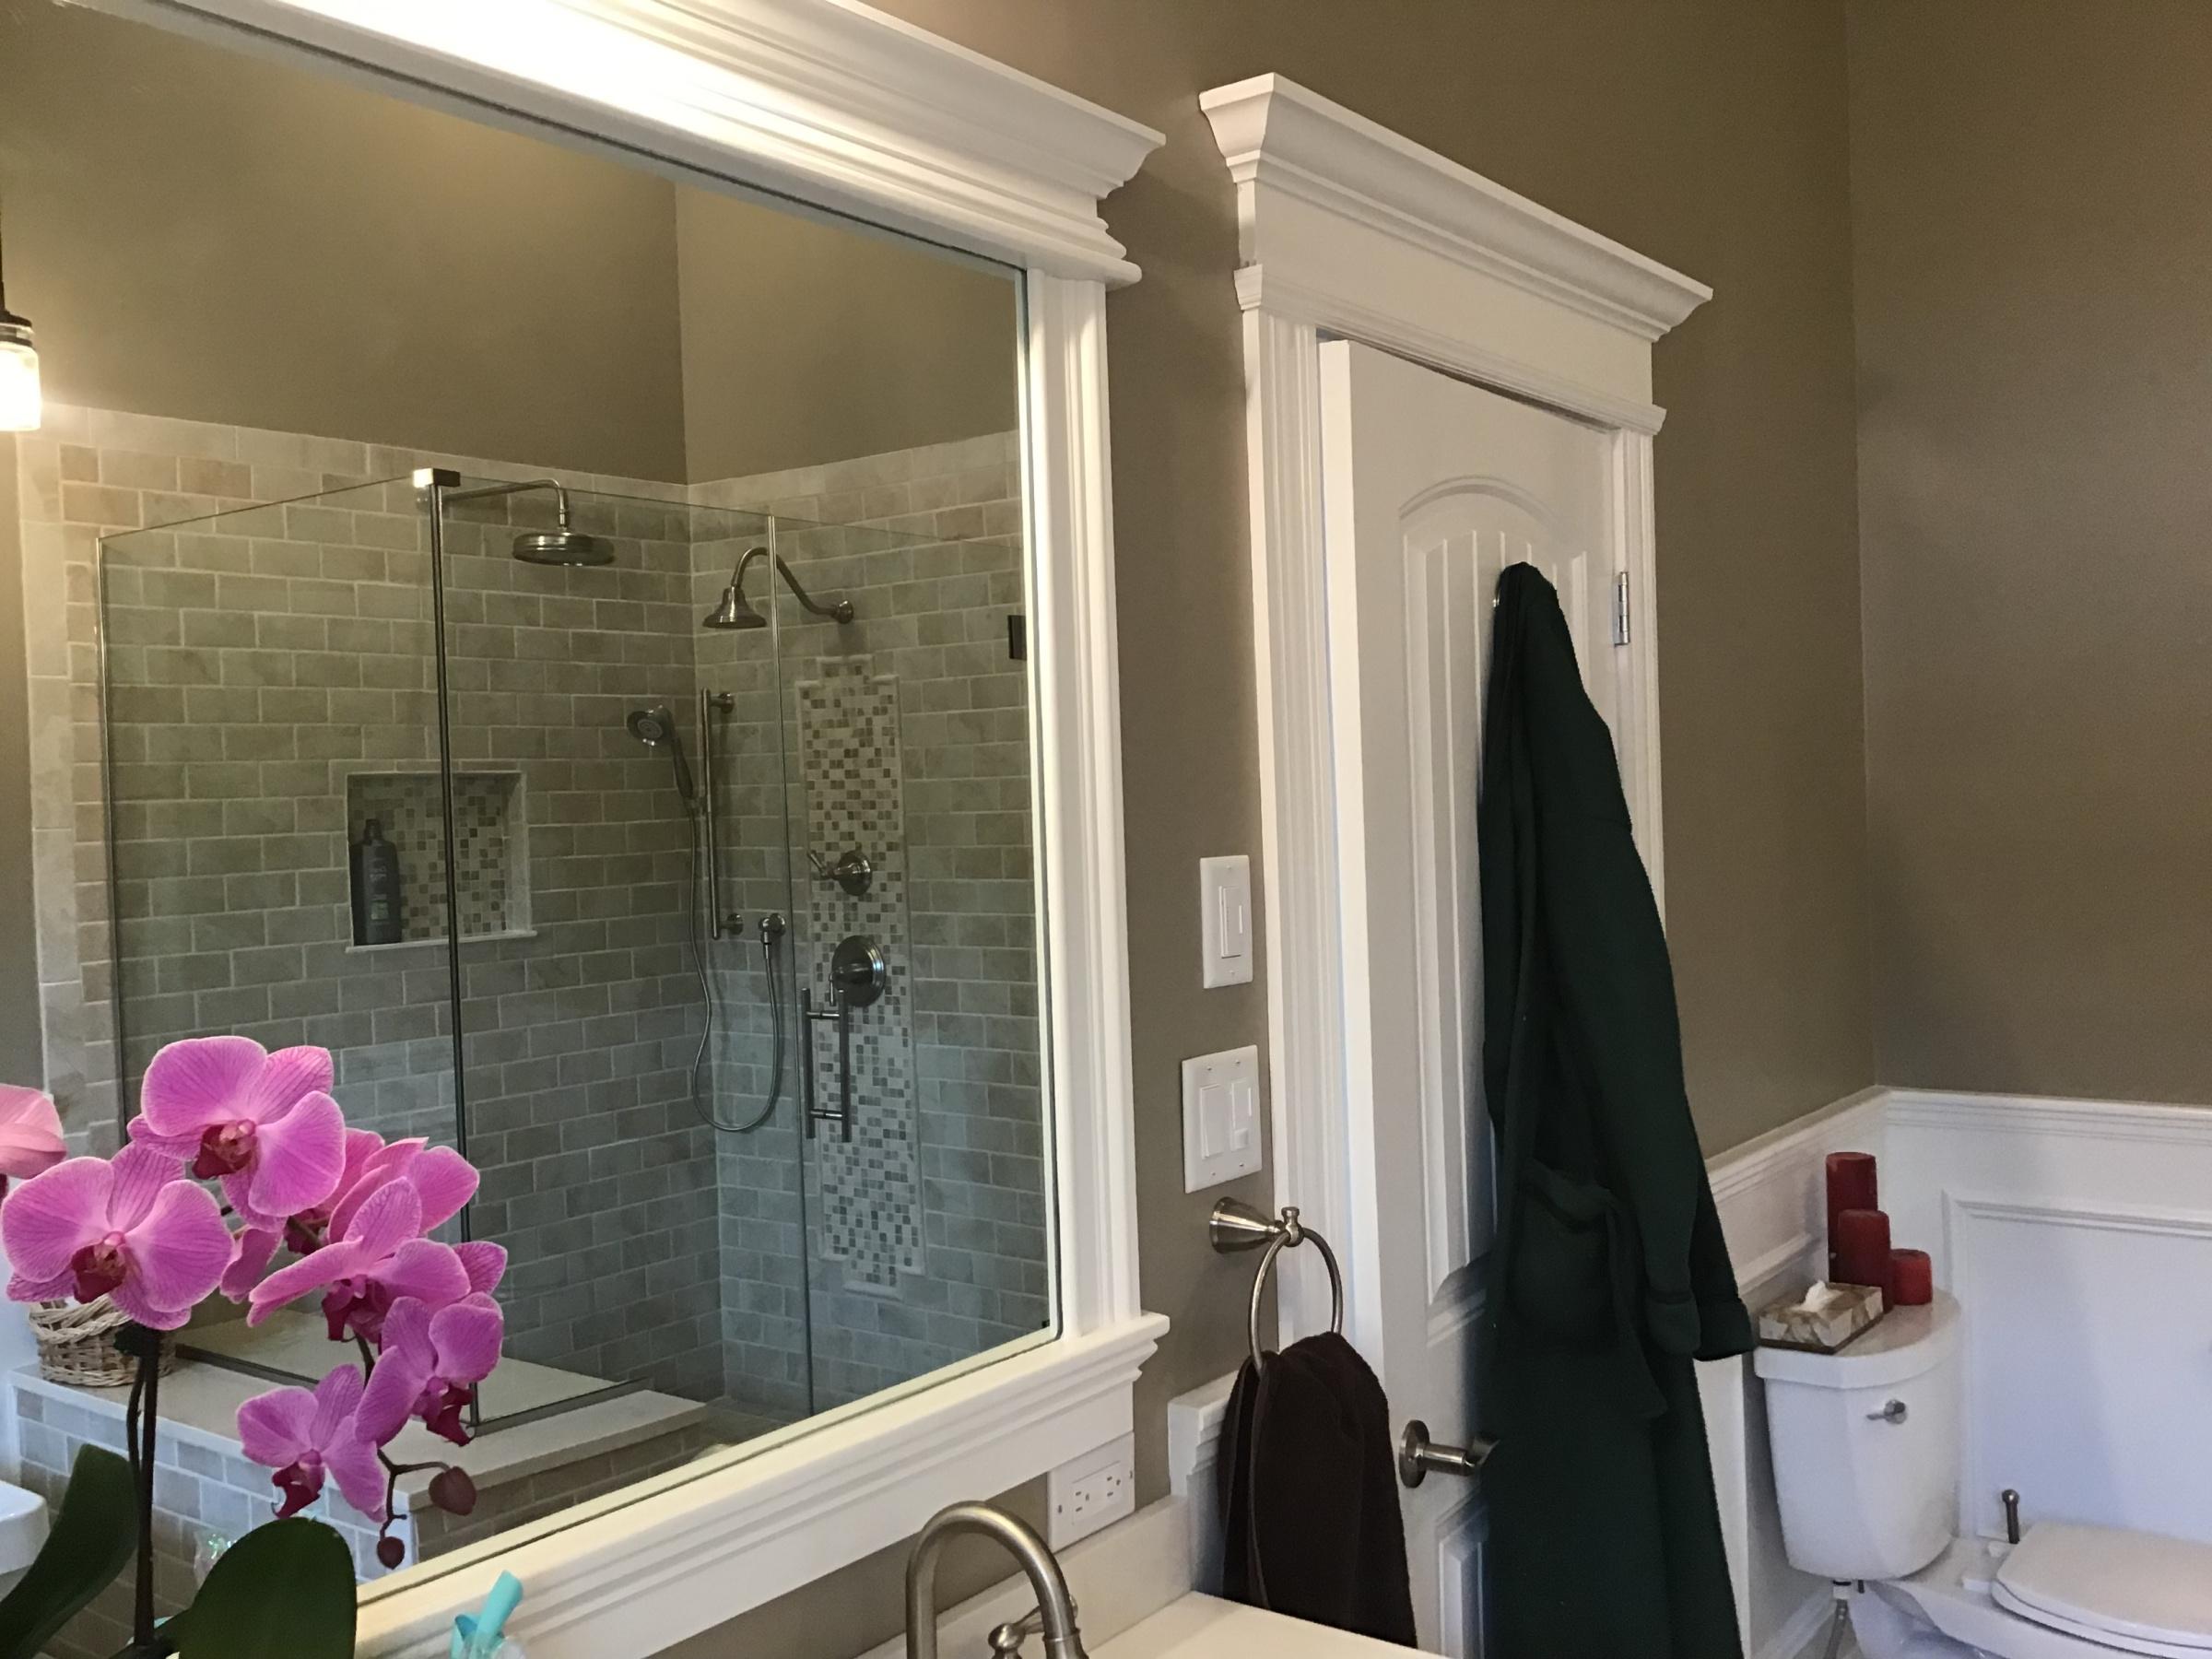 master bath in progress-31442899-6b2d-49be-88dd-0bd77391e5b2.jpg